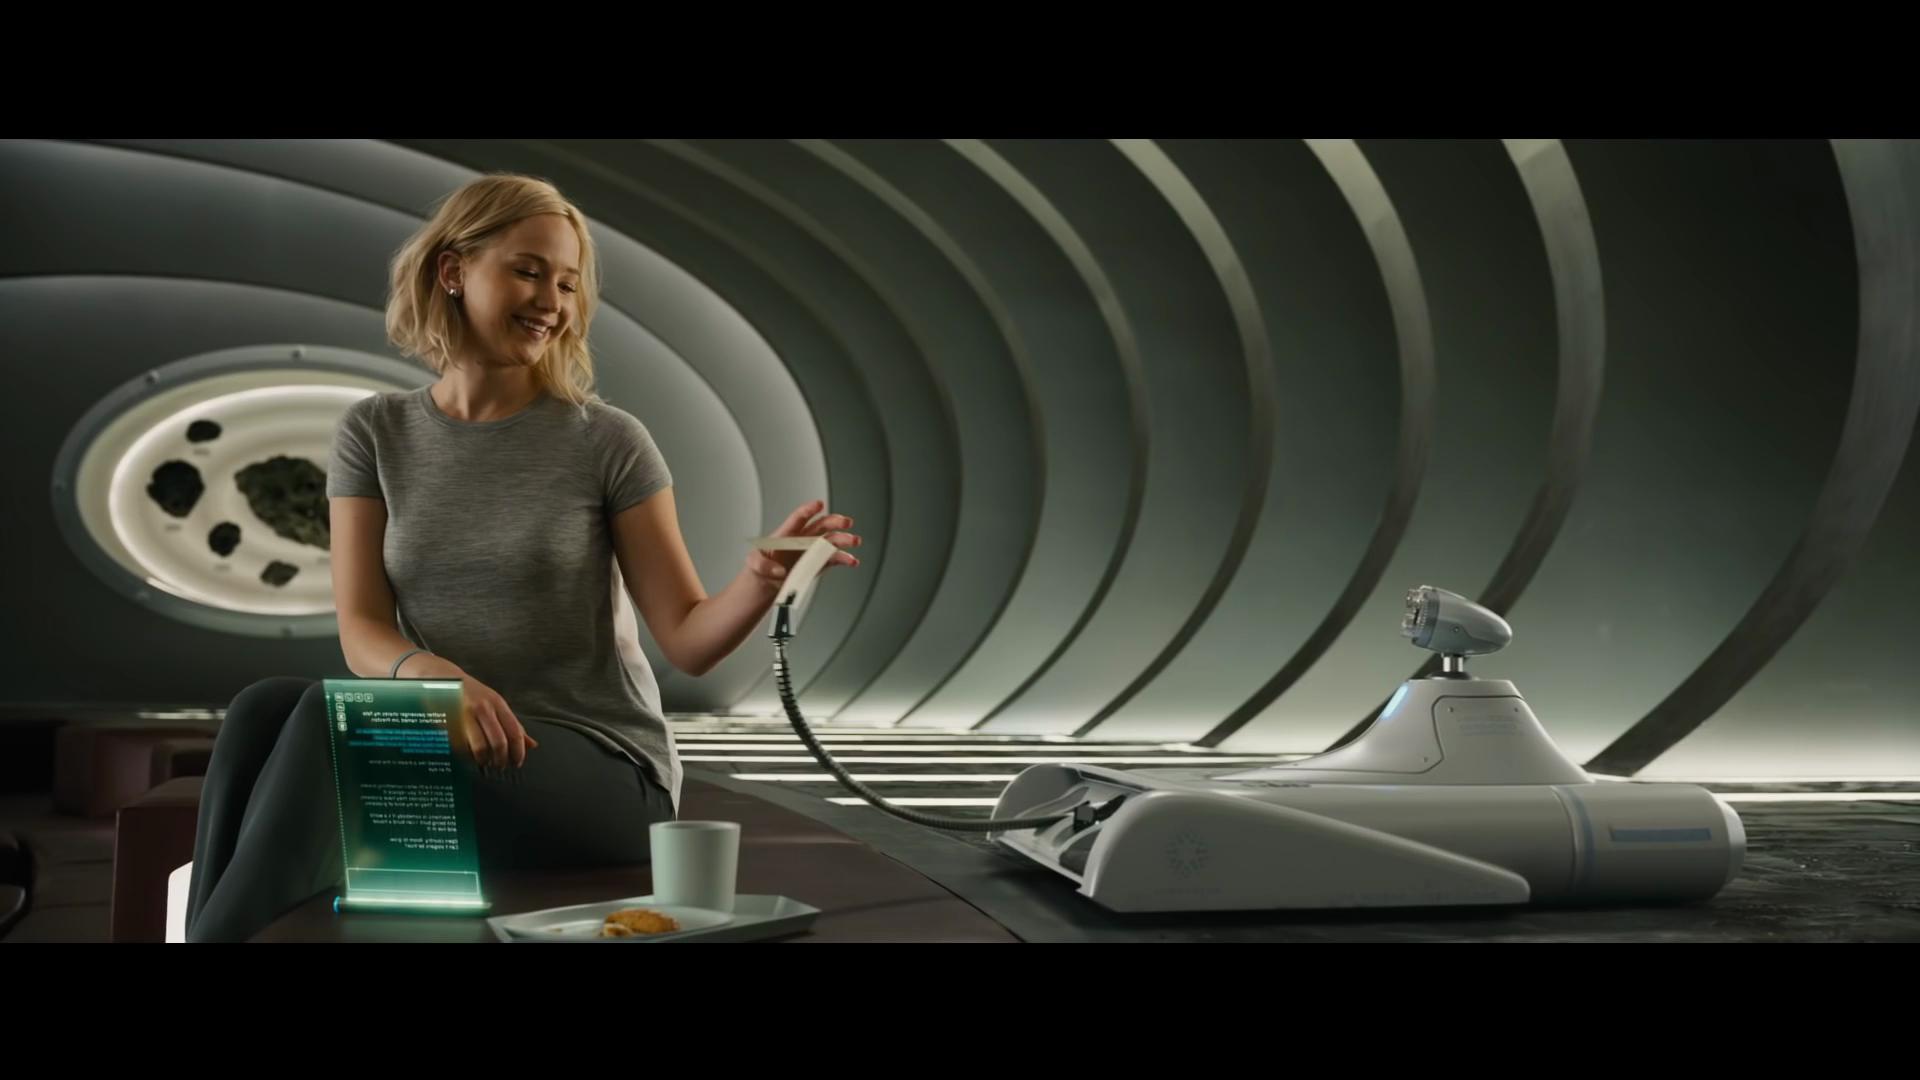 Пассажиры (2016) WEBRip 1080р | Трейлер